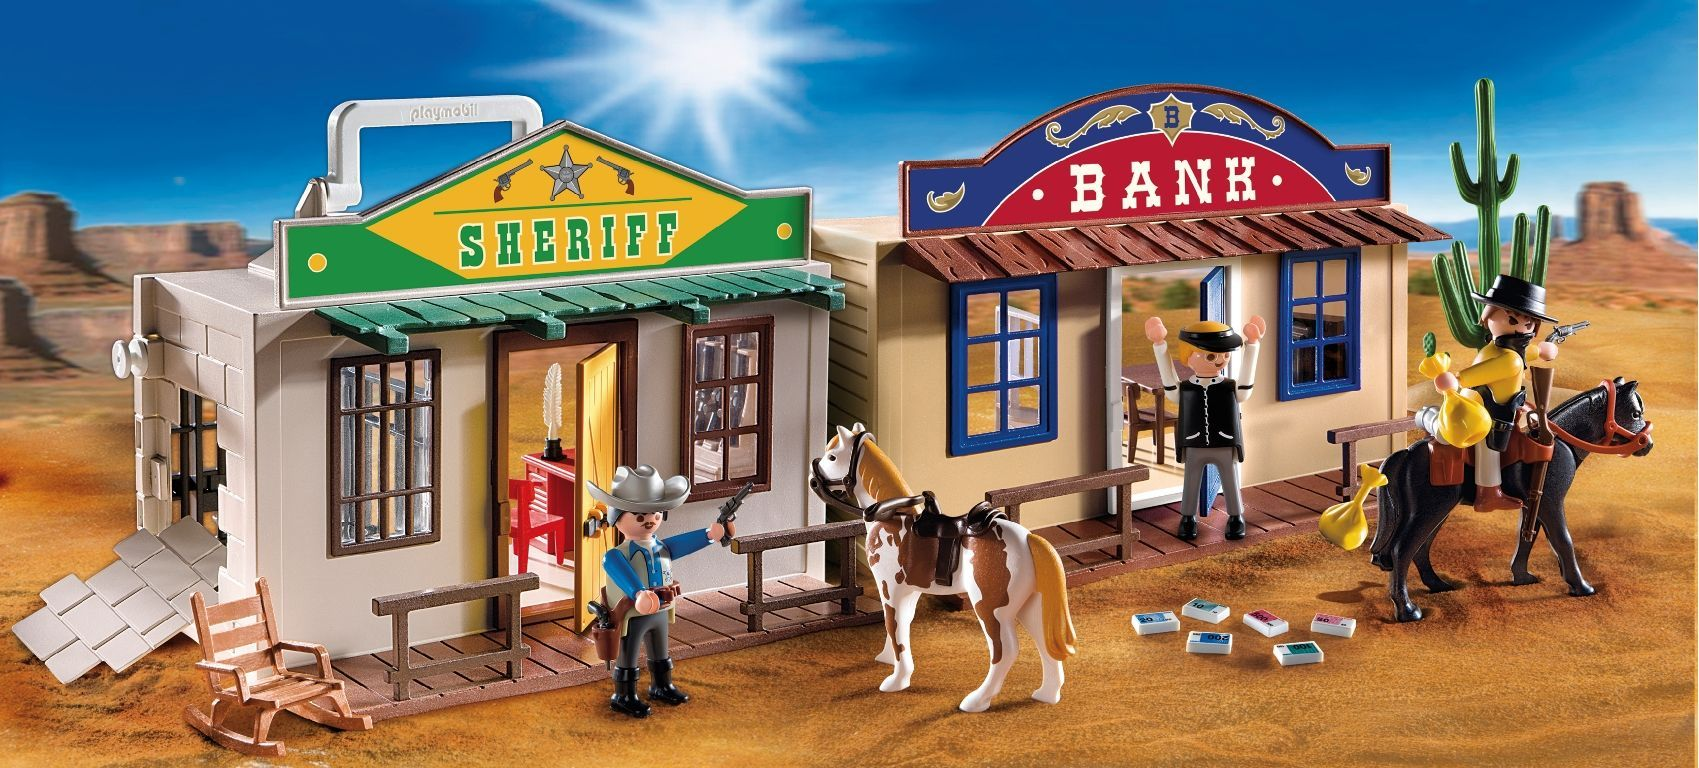 playmobil western  google search  playmobil toys westerns